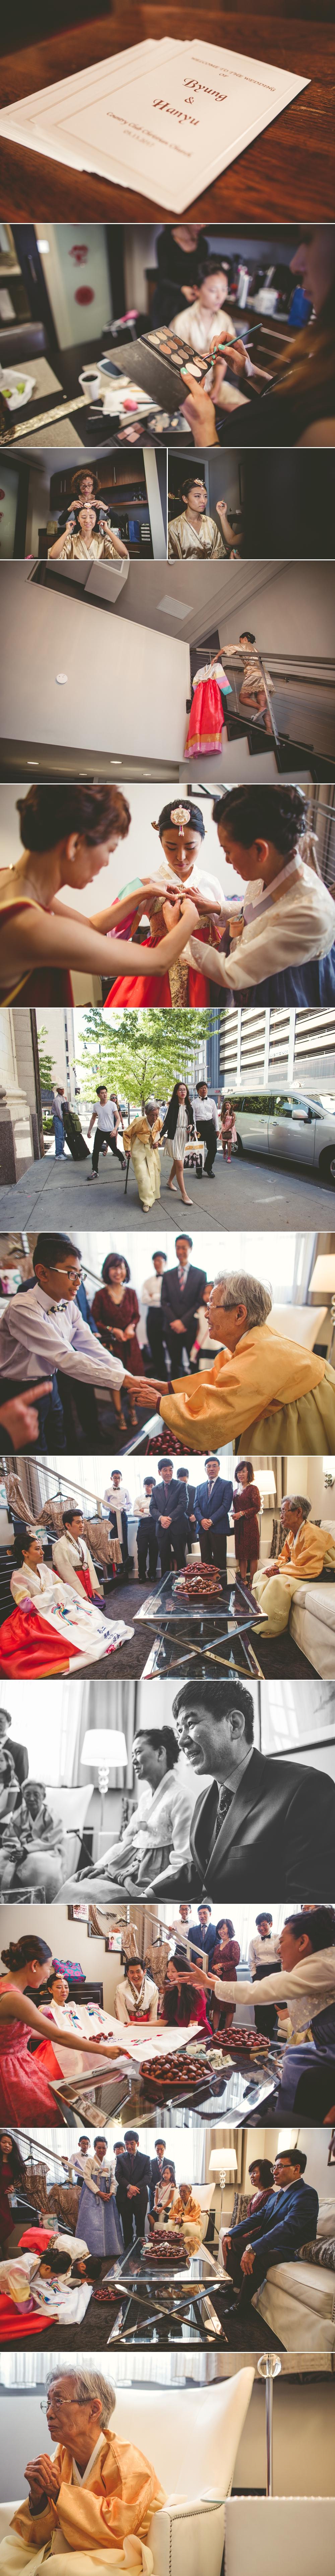 jason_domingues_photography_best_kansas_city_wedding_photographer_kc_weddings_korean_tea_ceremony_mark_twain_ballroom_00011.jpg